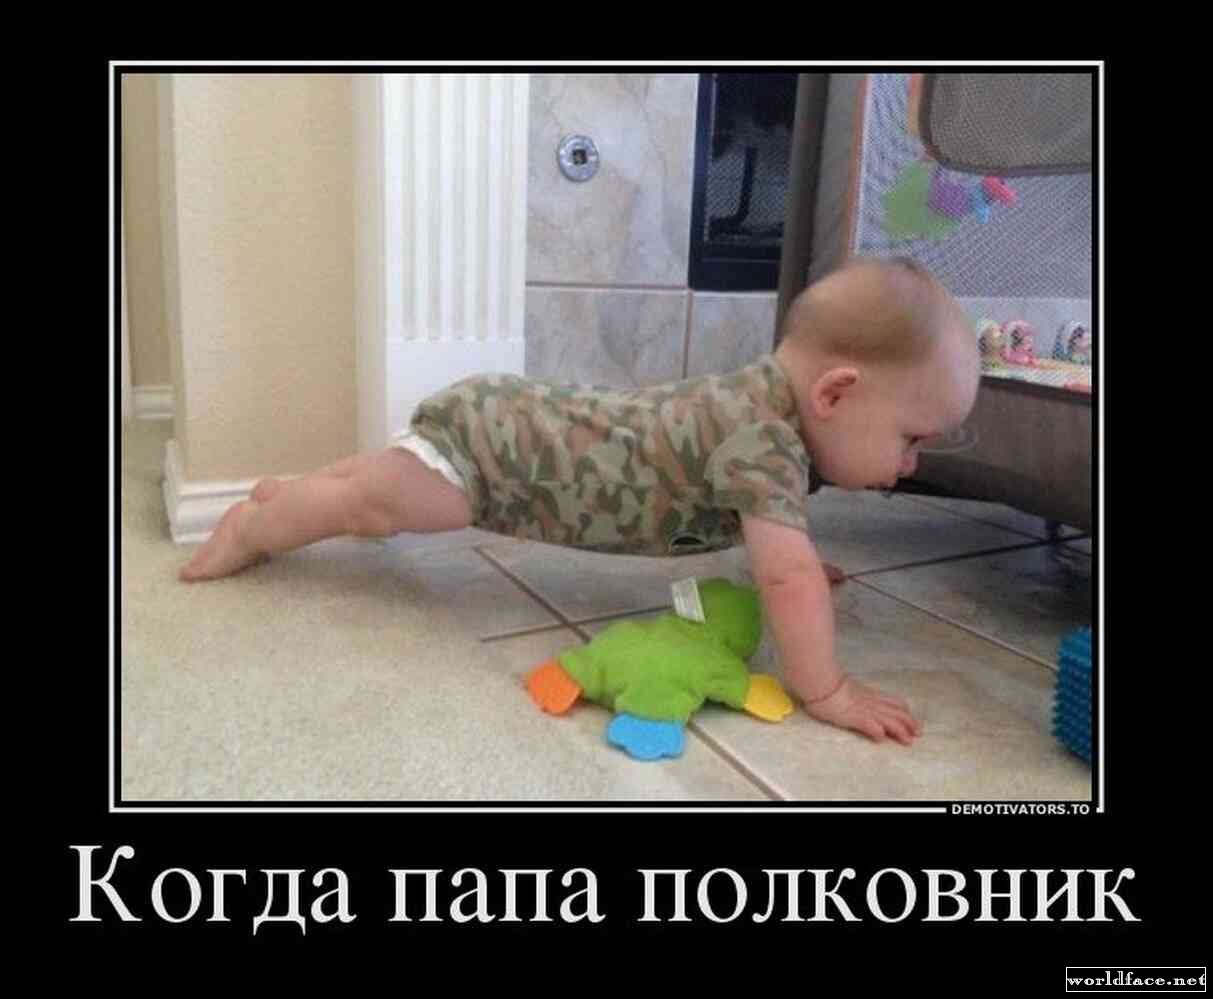 http://worldface.net/uploads/posts/2013-11/1385314418_1380699365_demotivatory.jpg